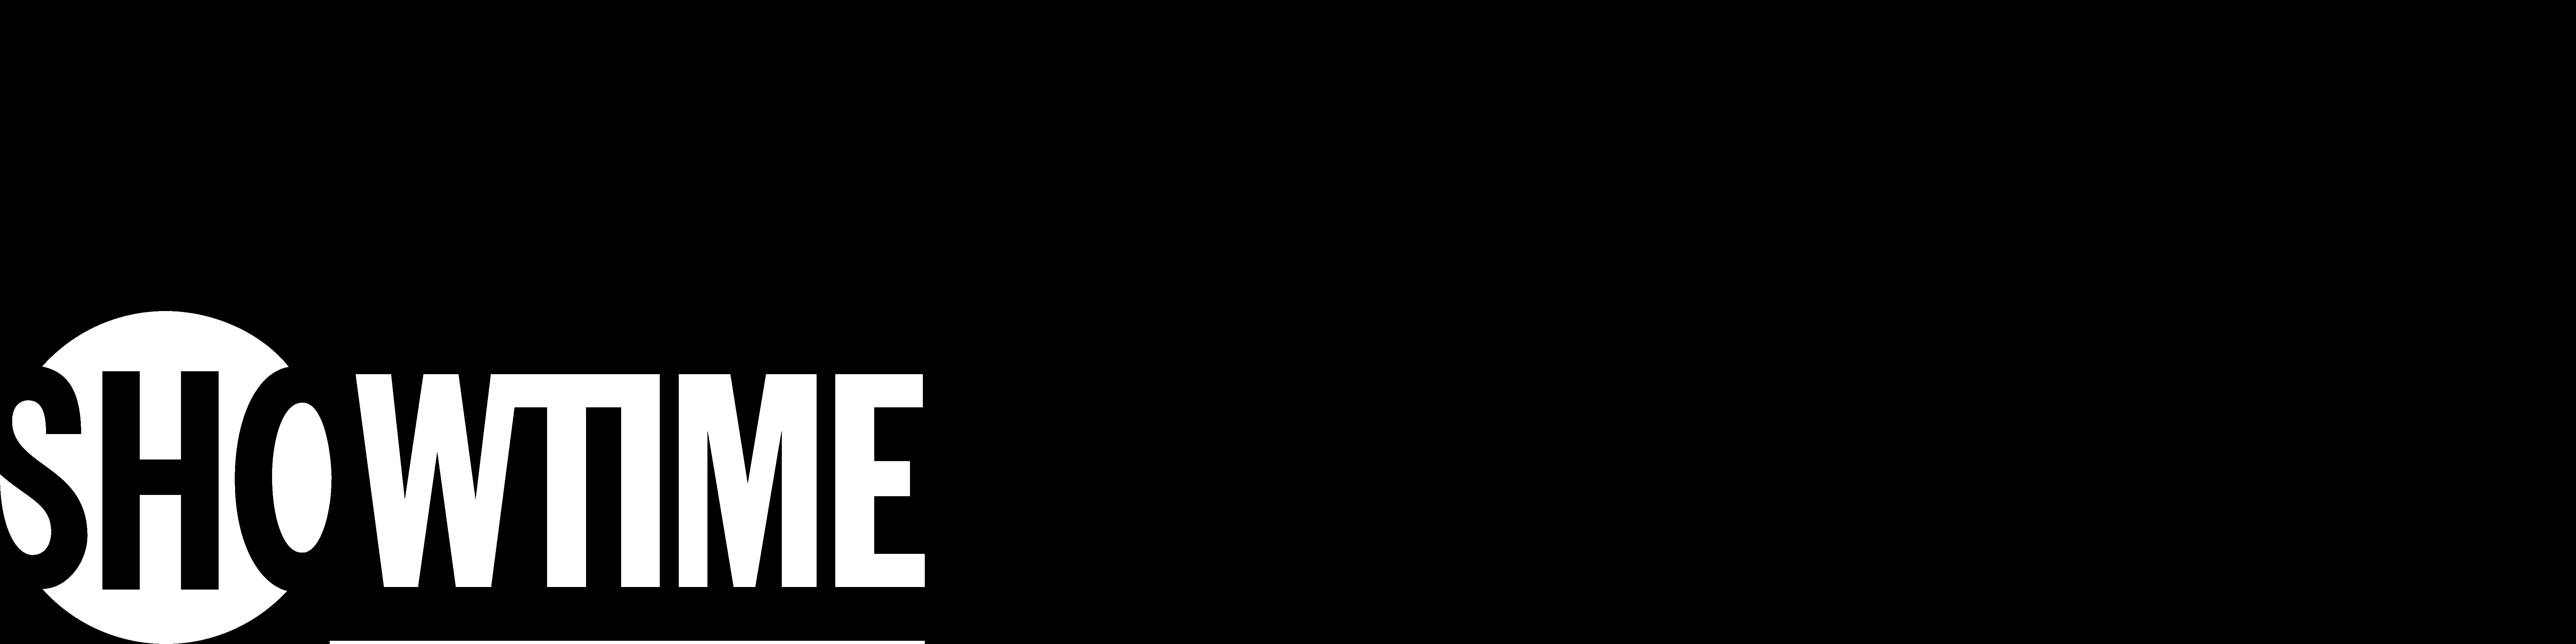 SHOWTIME 4x1 promo teaser logo.png